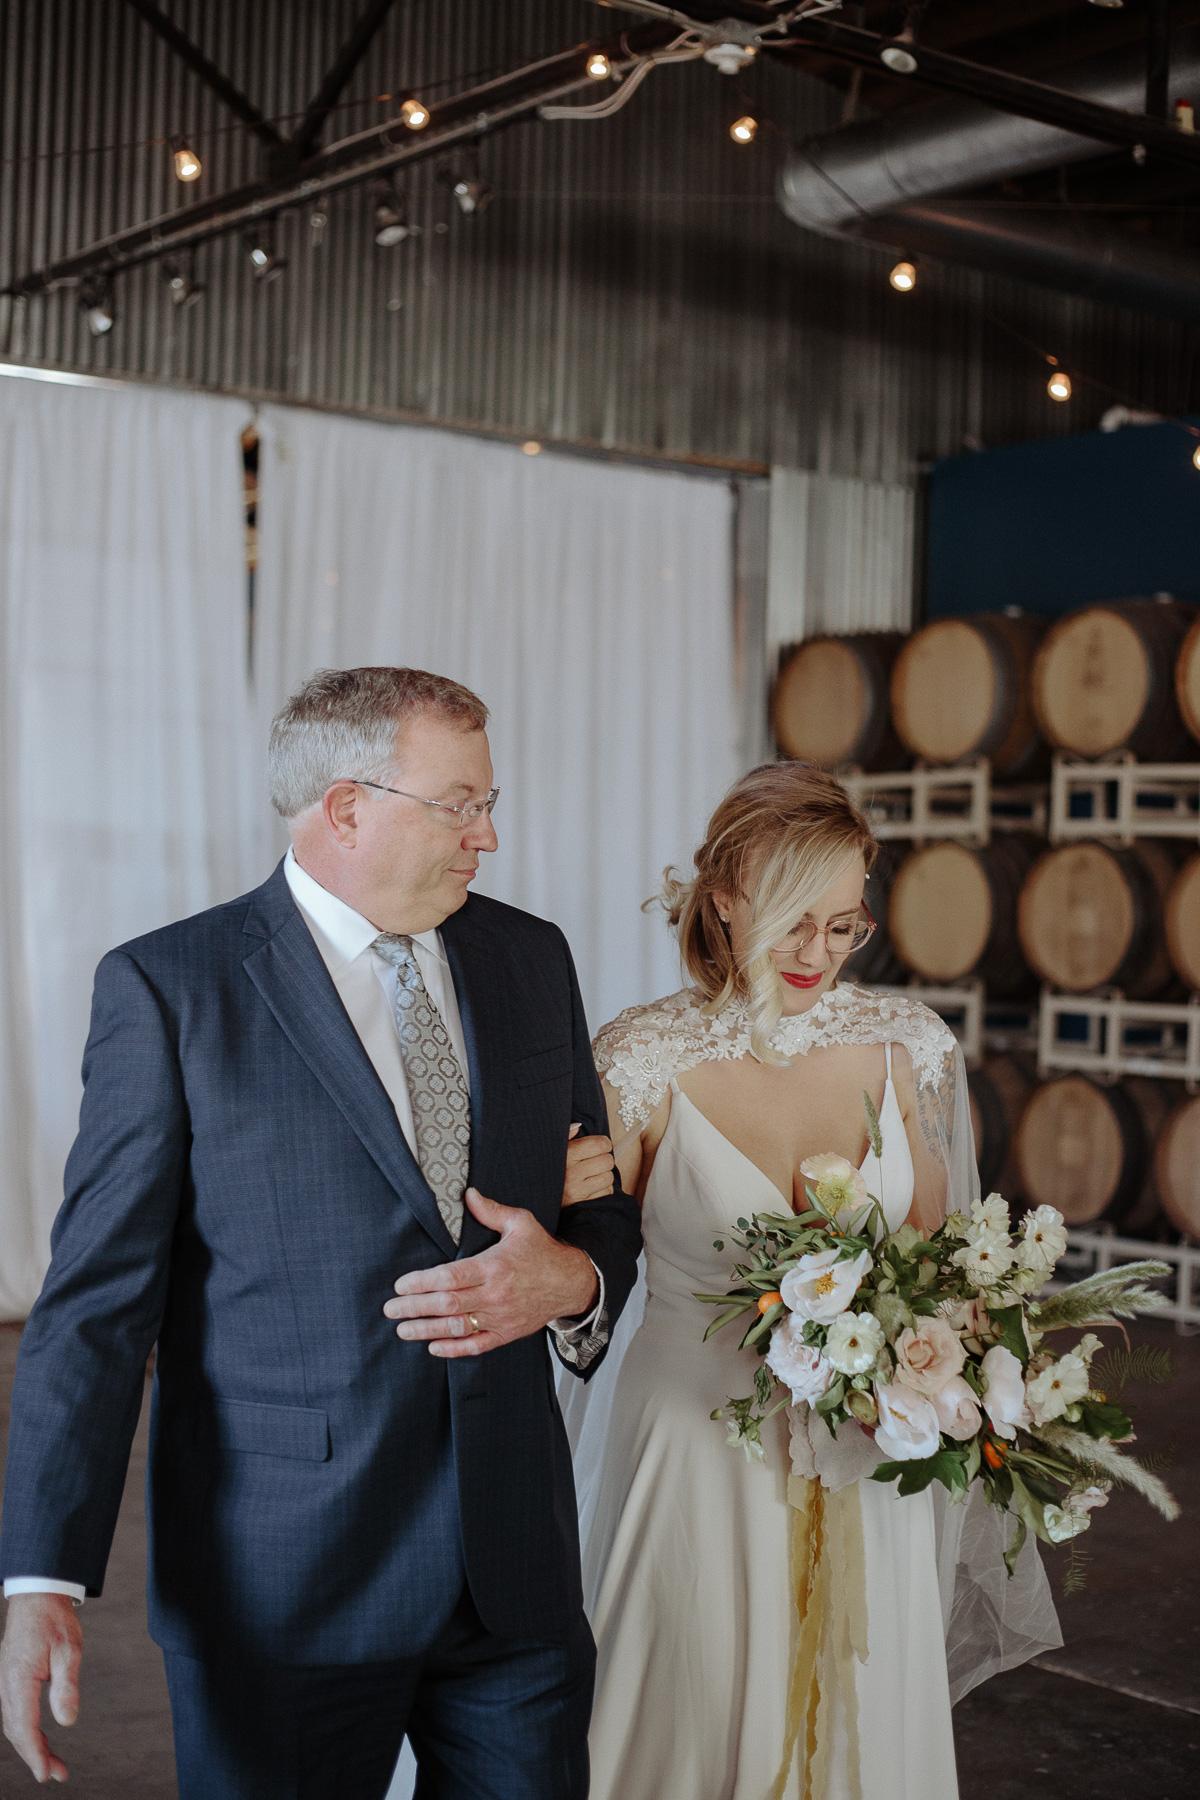 enowen-wedding-photography-mike-anna-suffolk-punch-charlotte (35 of 78).jpg